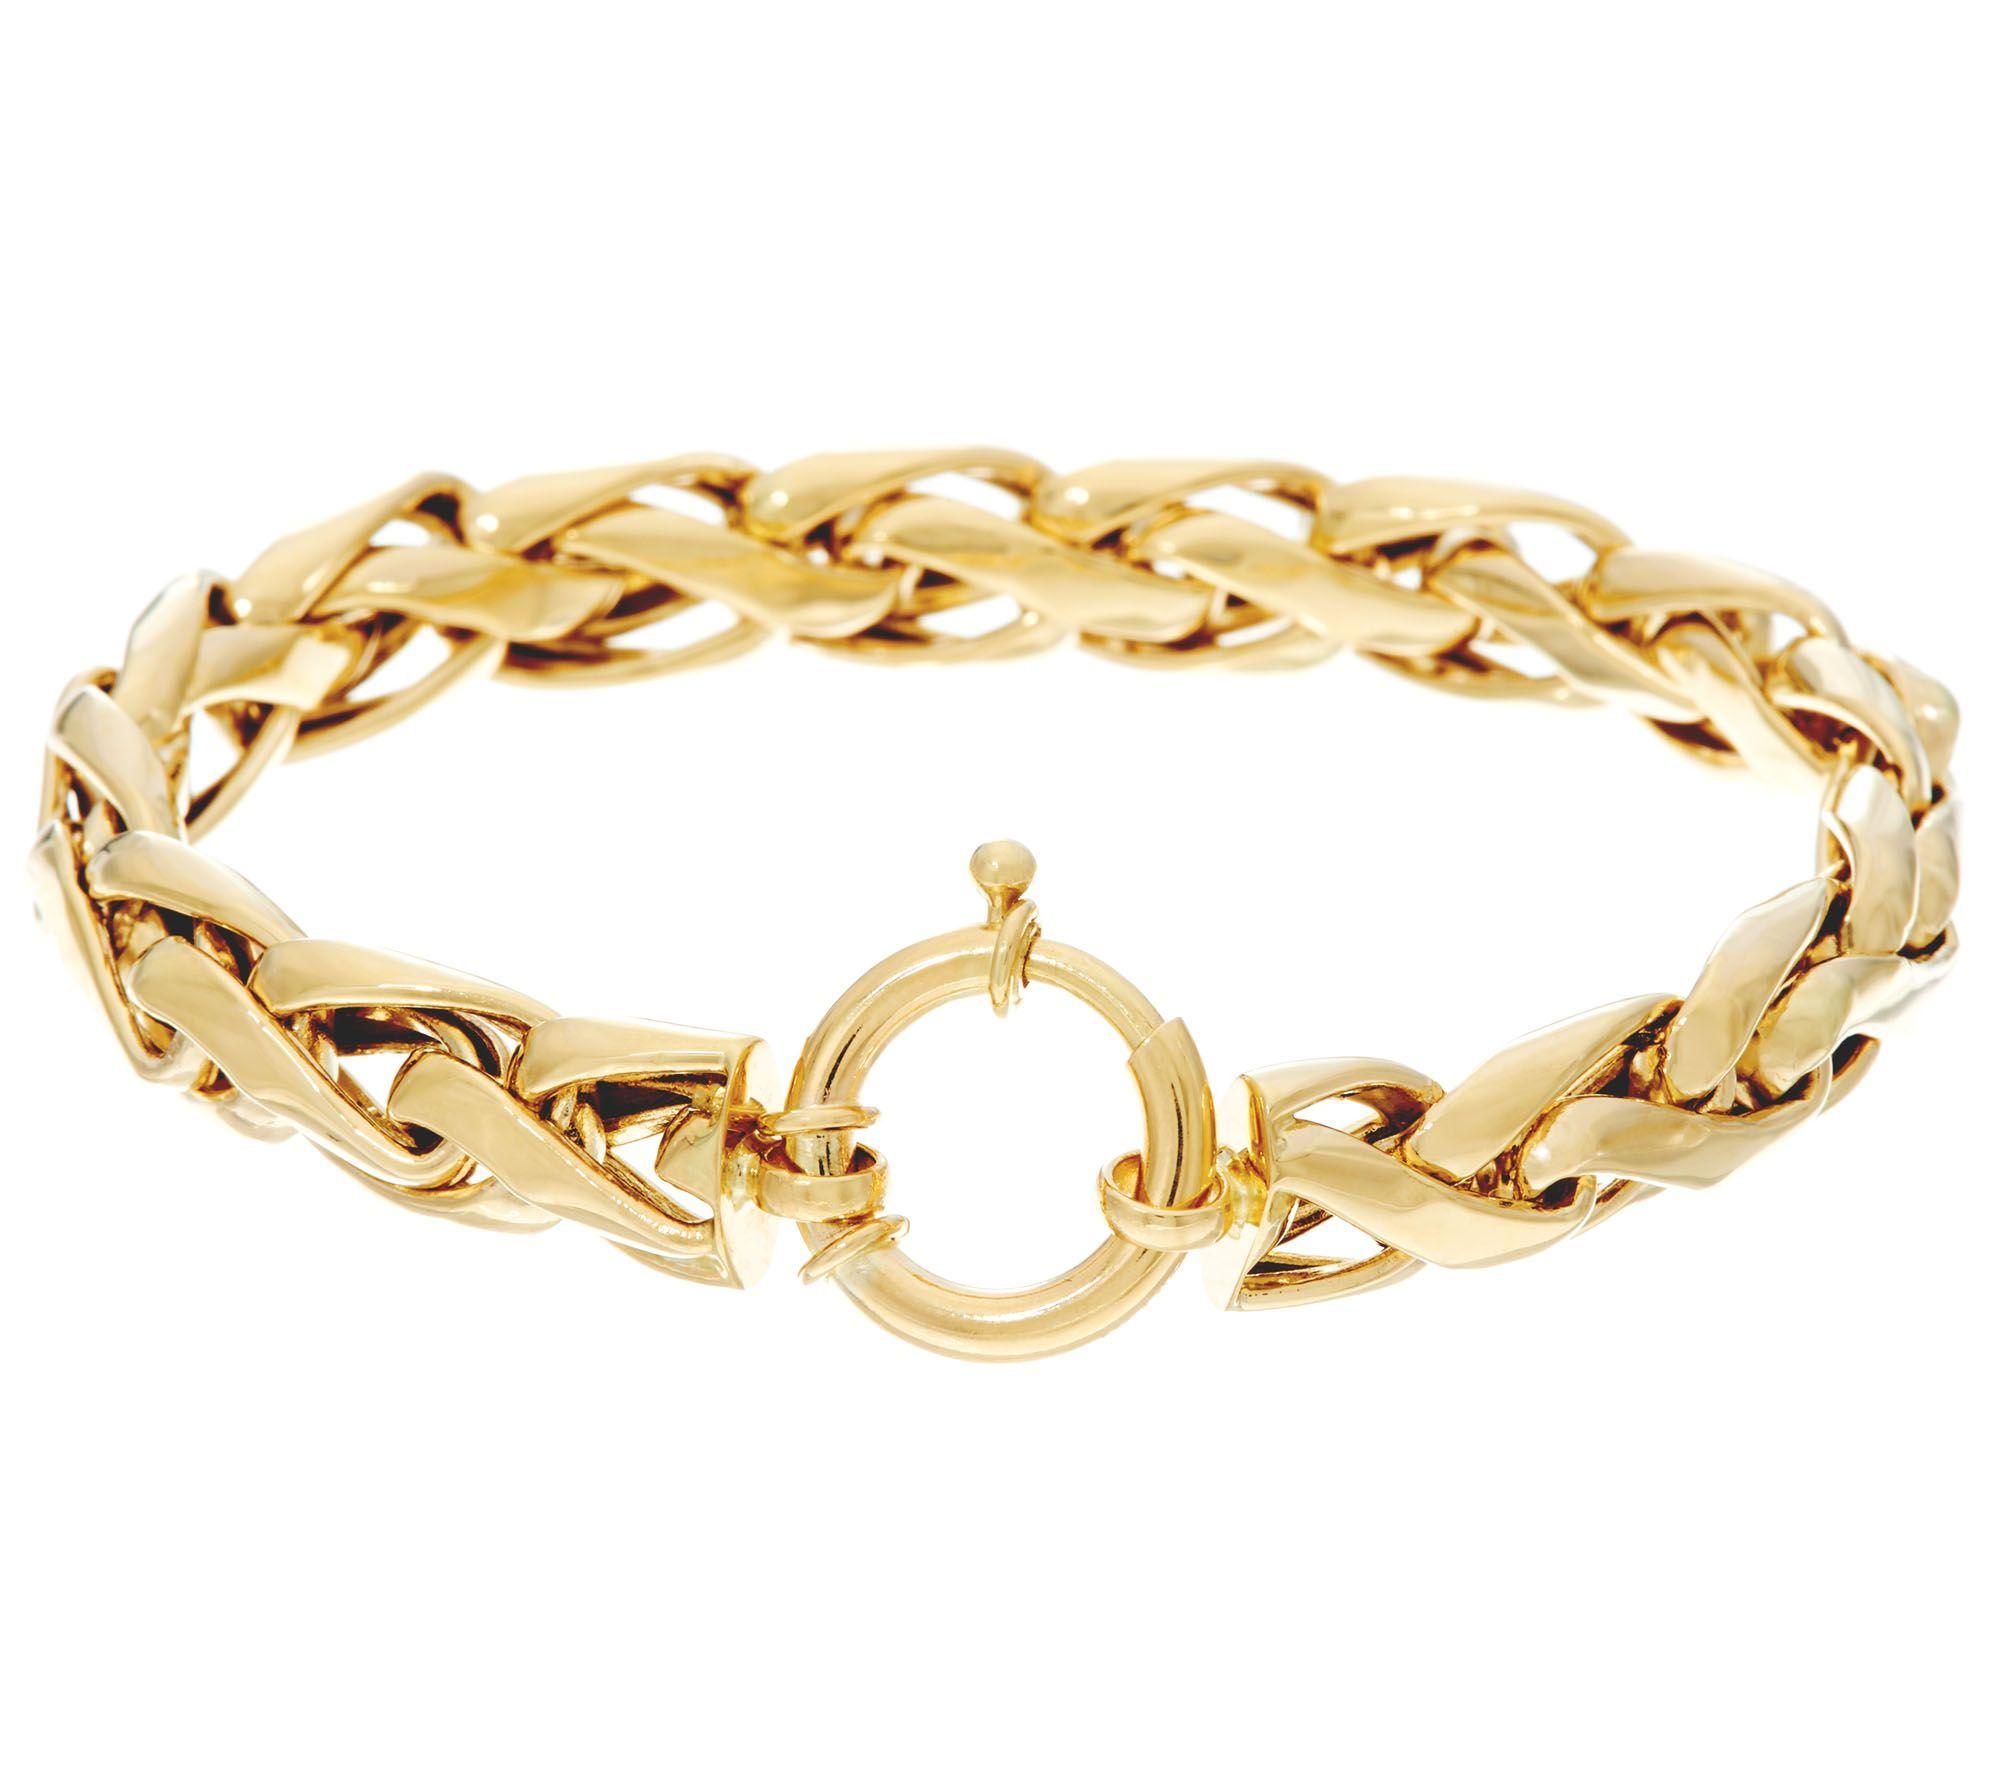 14k Gold Polished Woven Wheat Bracelet